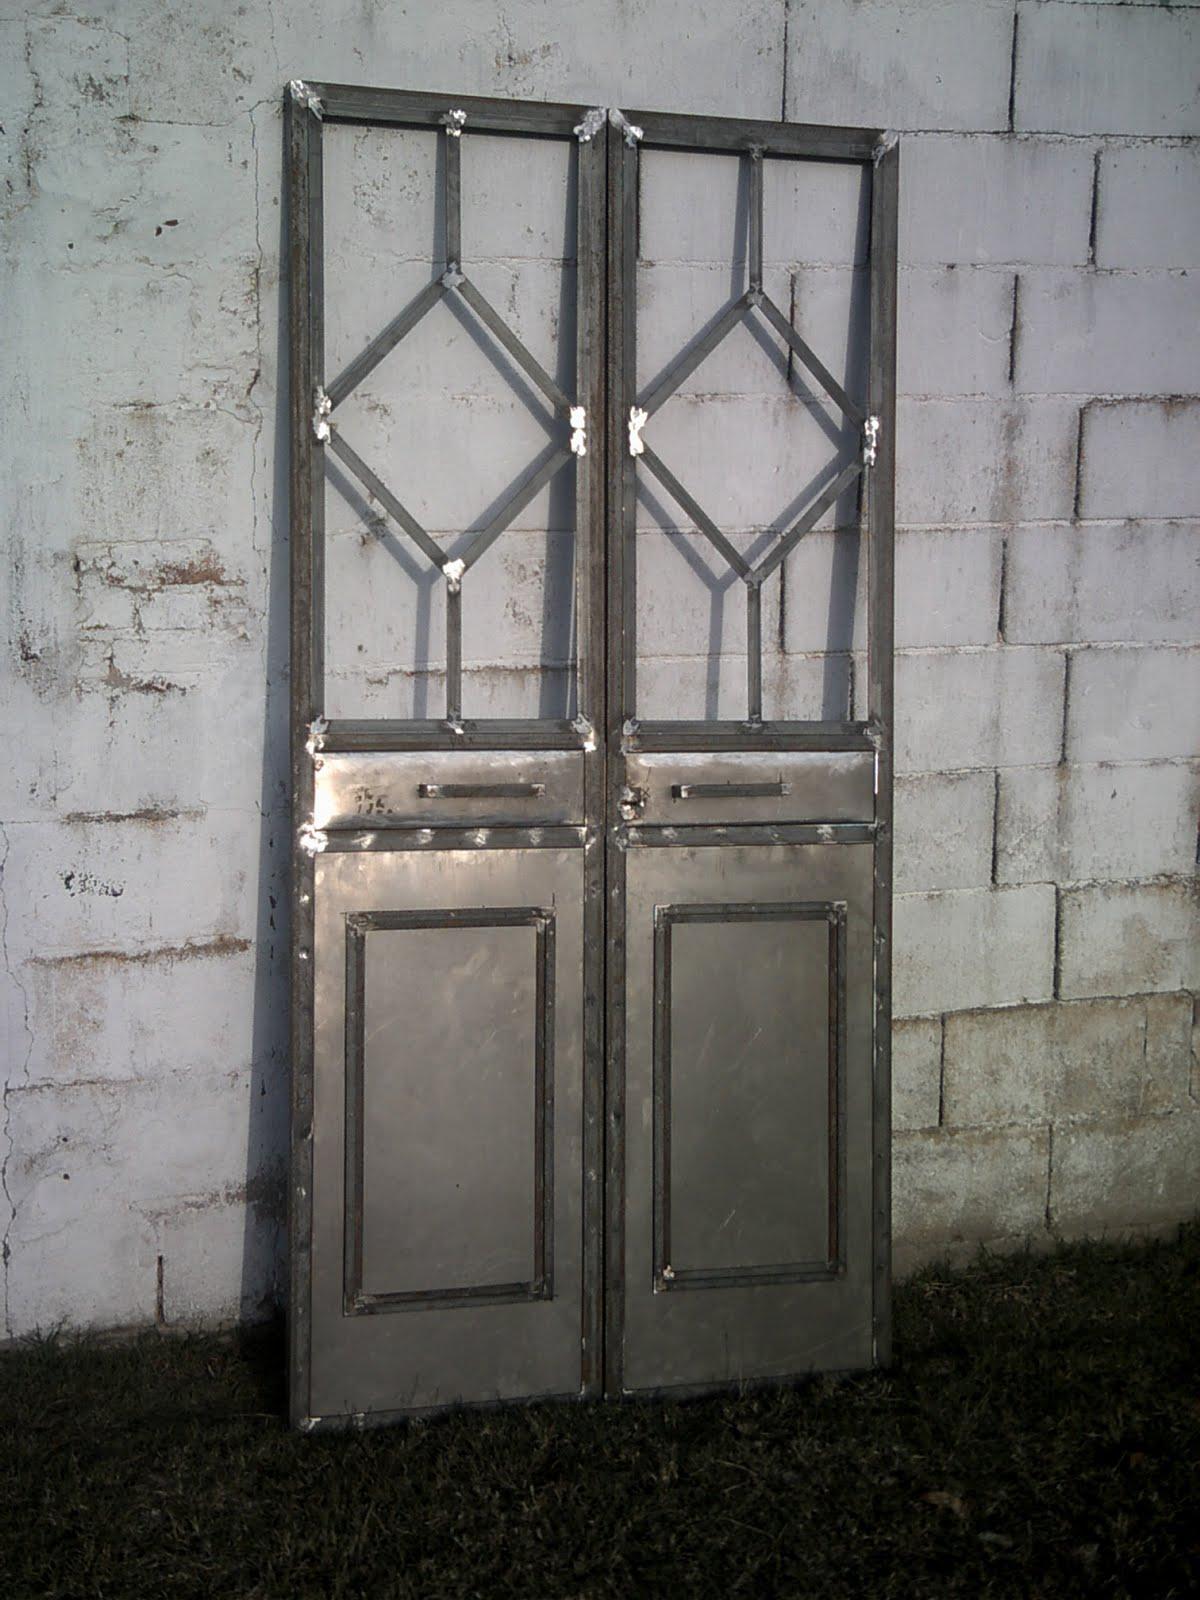 Puertas forjadas herreria artistica fotos ajilbab portal for Puertas de herreria artistica